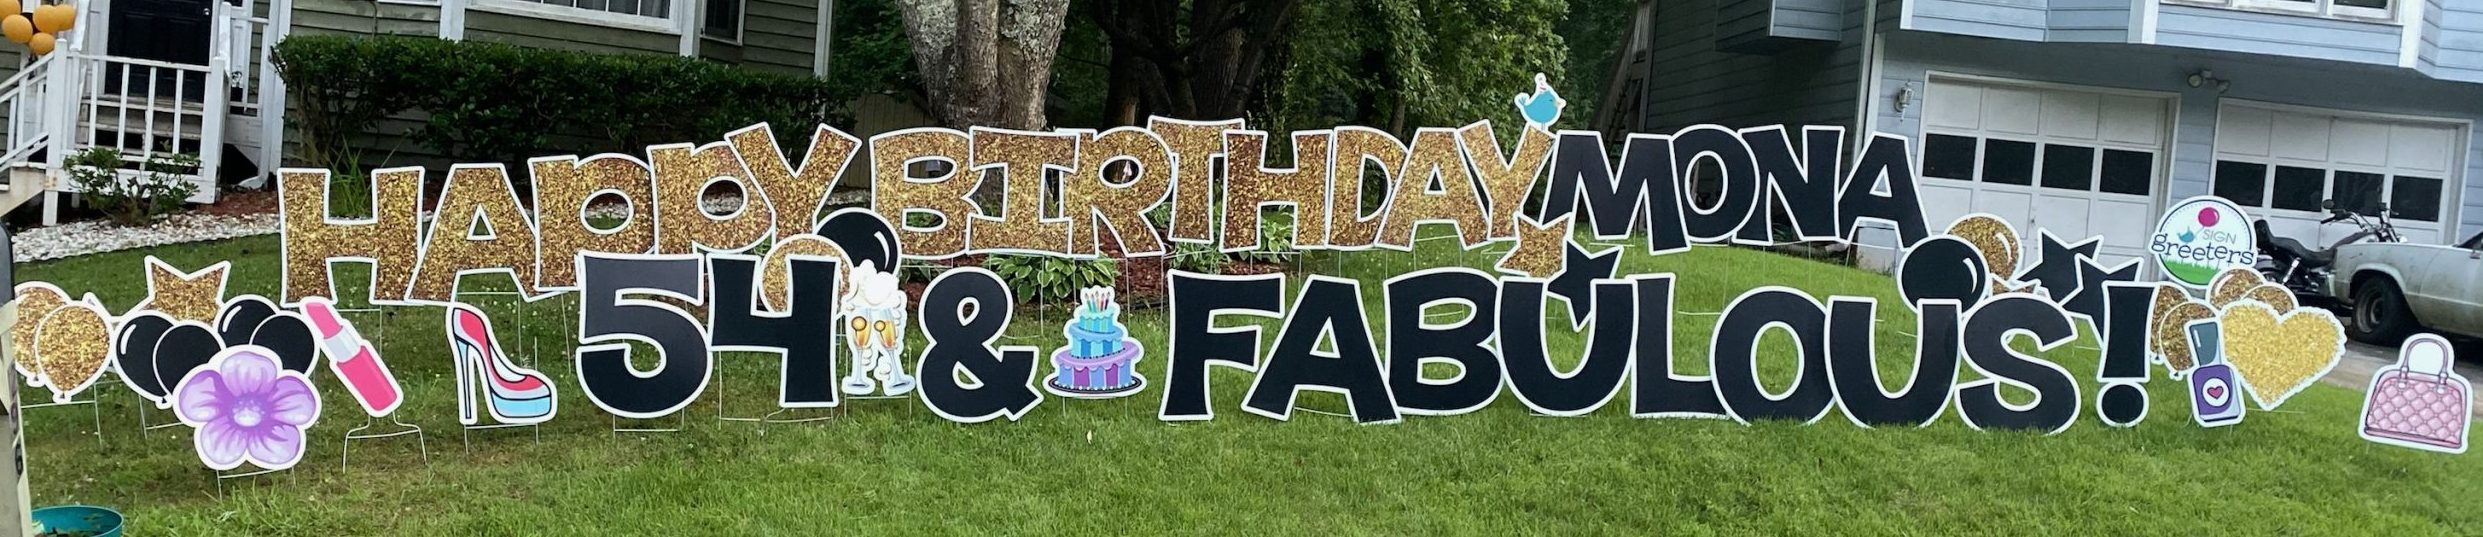 Mona Celebrates 54 And Fabulous Sign Greeters